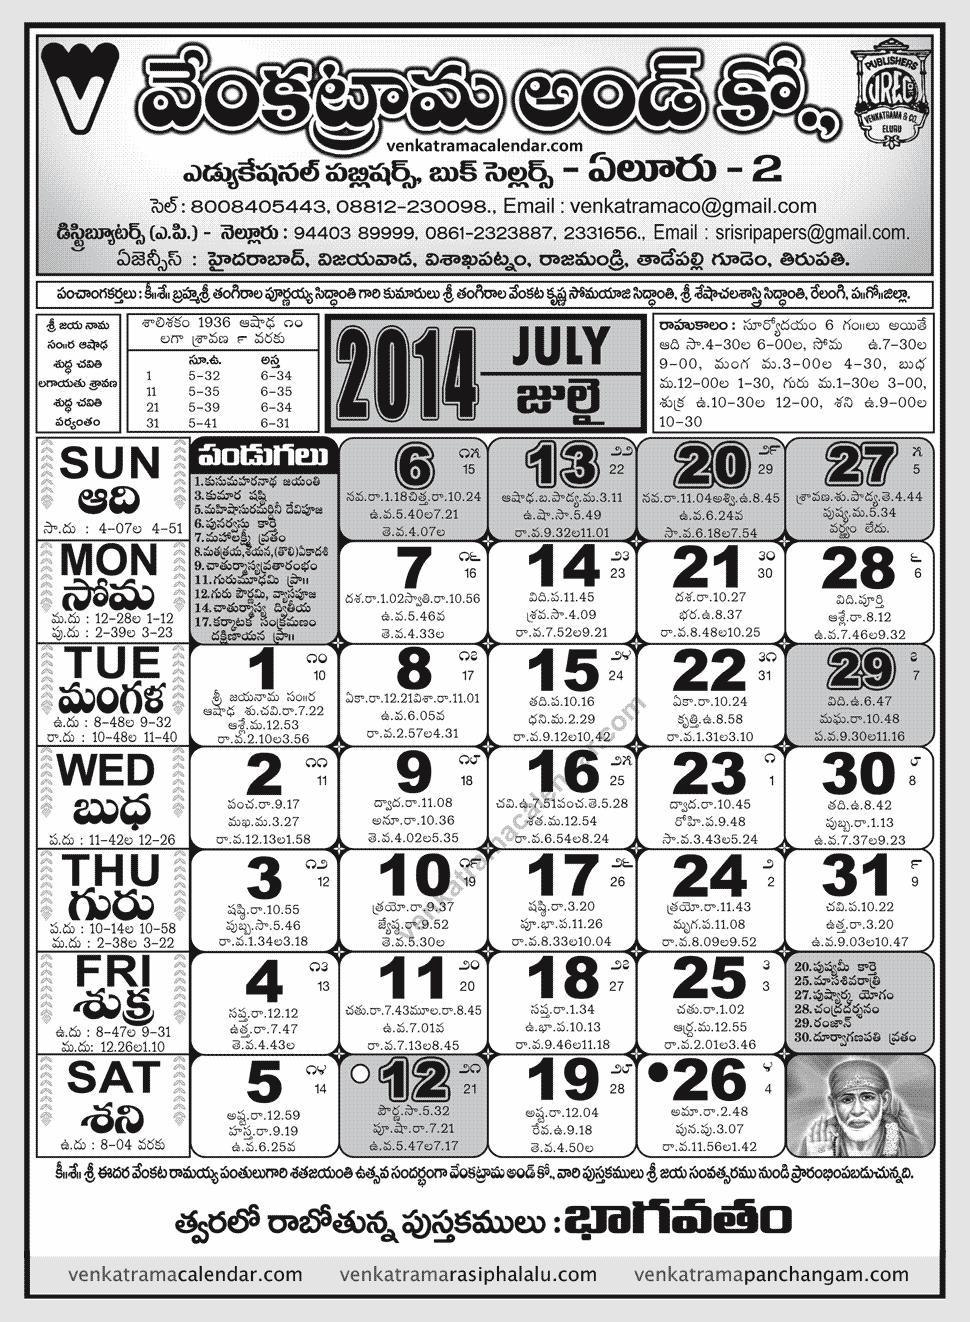 July 2014: Venkatrama & Co Calendar 2014: July 2014 Telugu Calendar